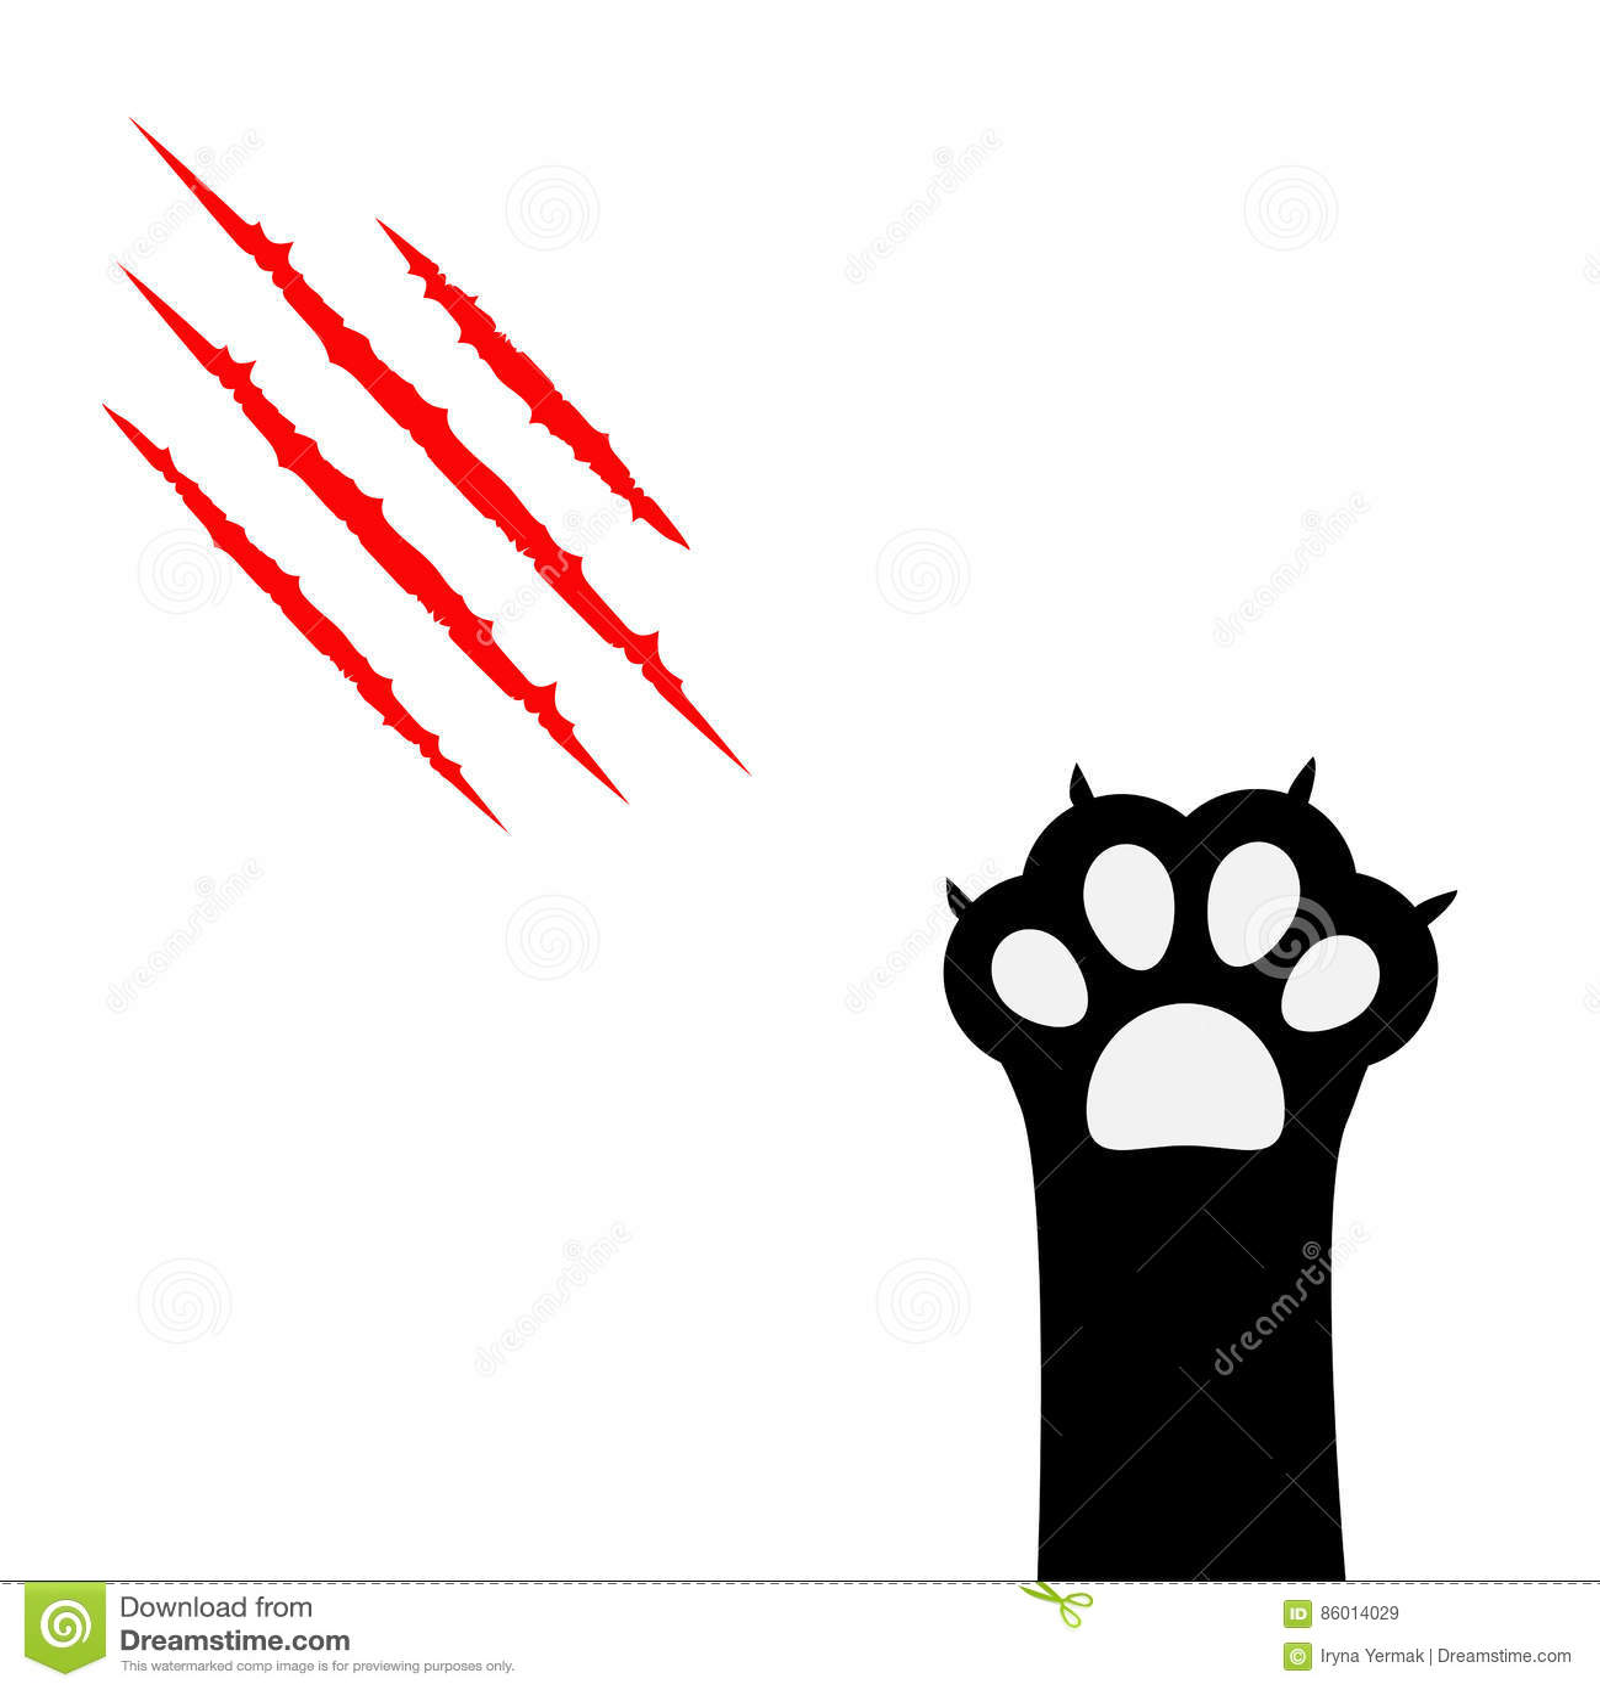 bloody scratch marks cartoon vector cartoondealer com bear claw marks clipart free claw marks clipart